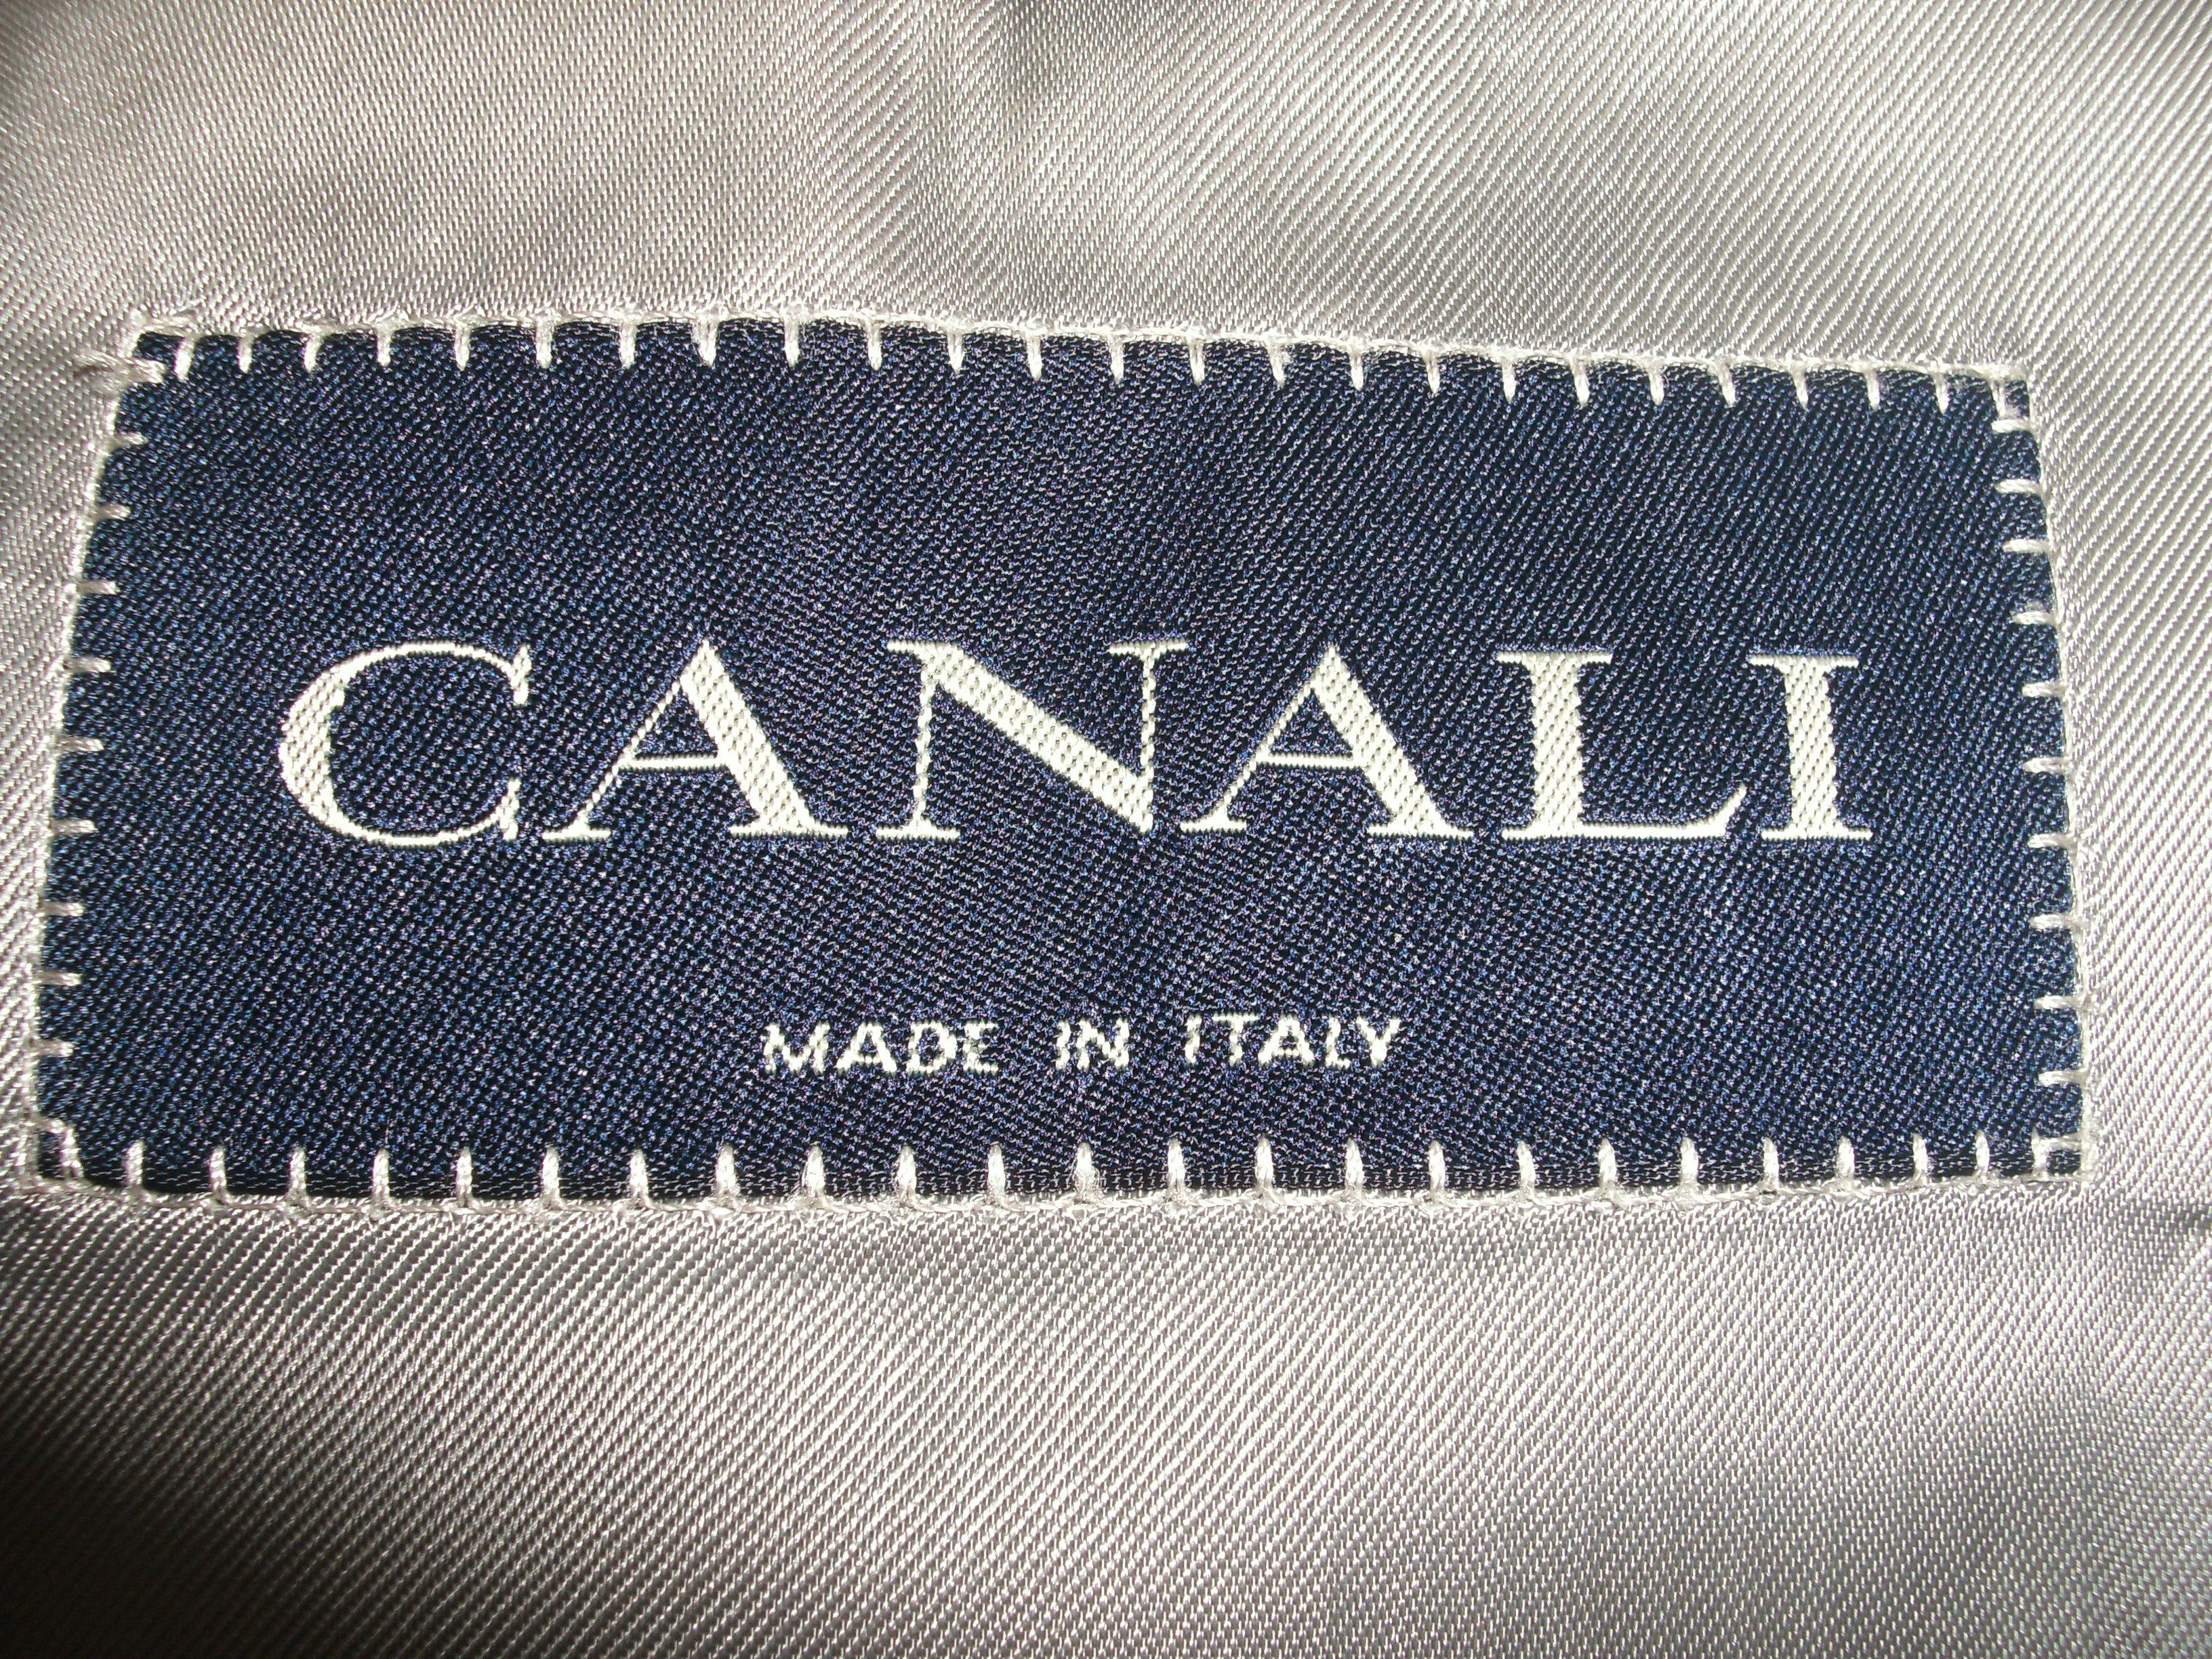 Canali Plaid (8).JPG